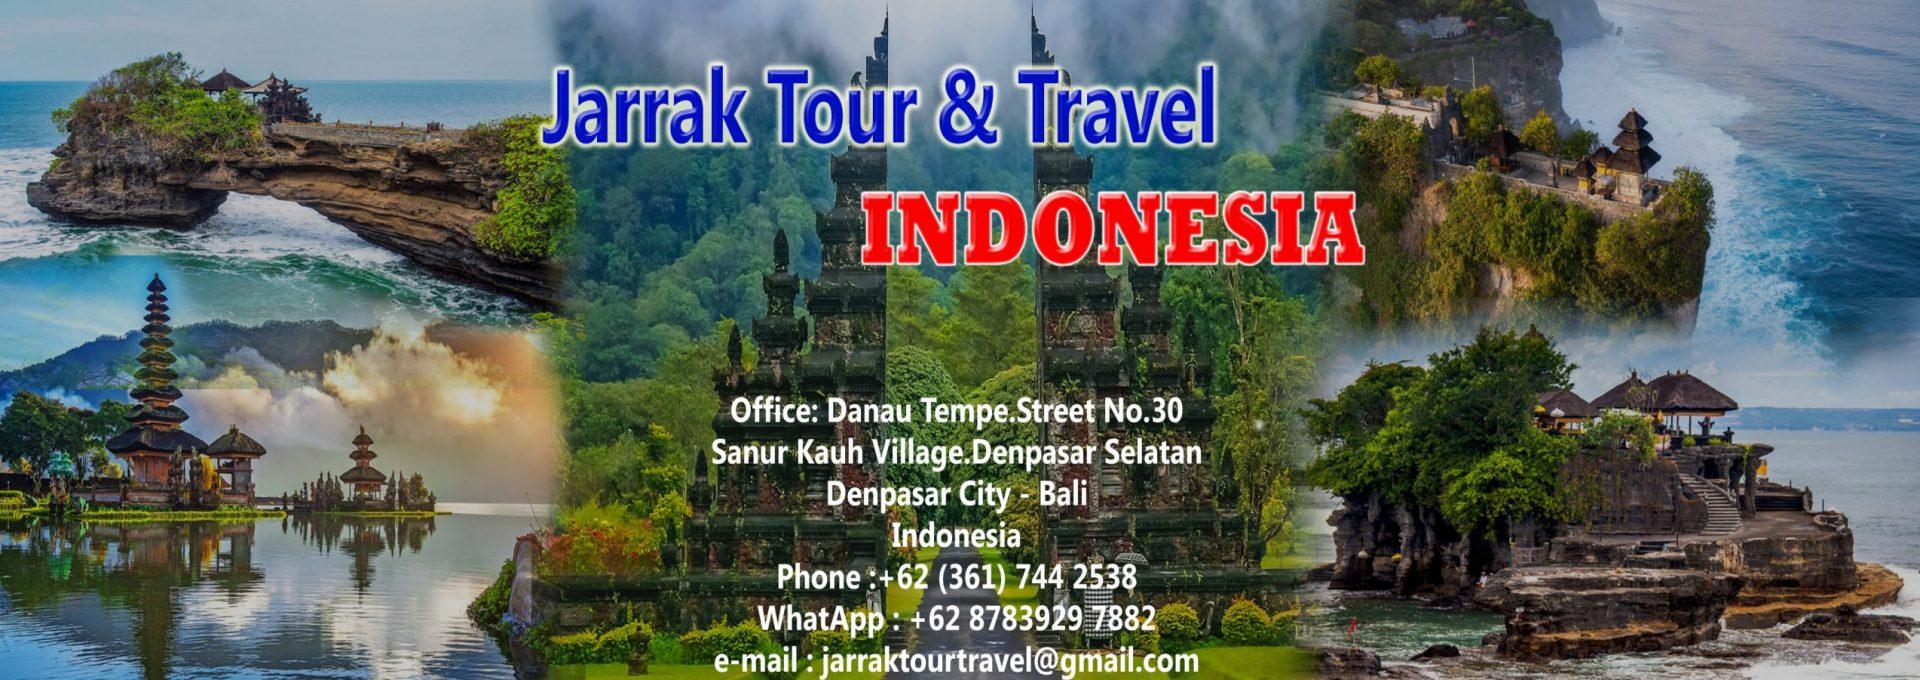 Jarrak Tour and Travel